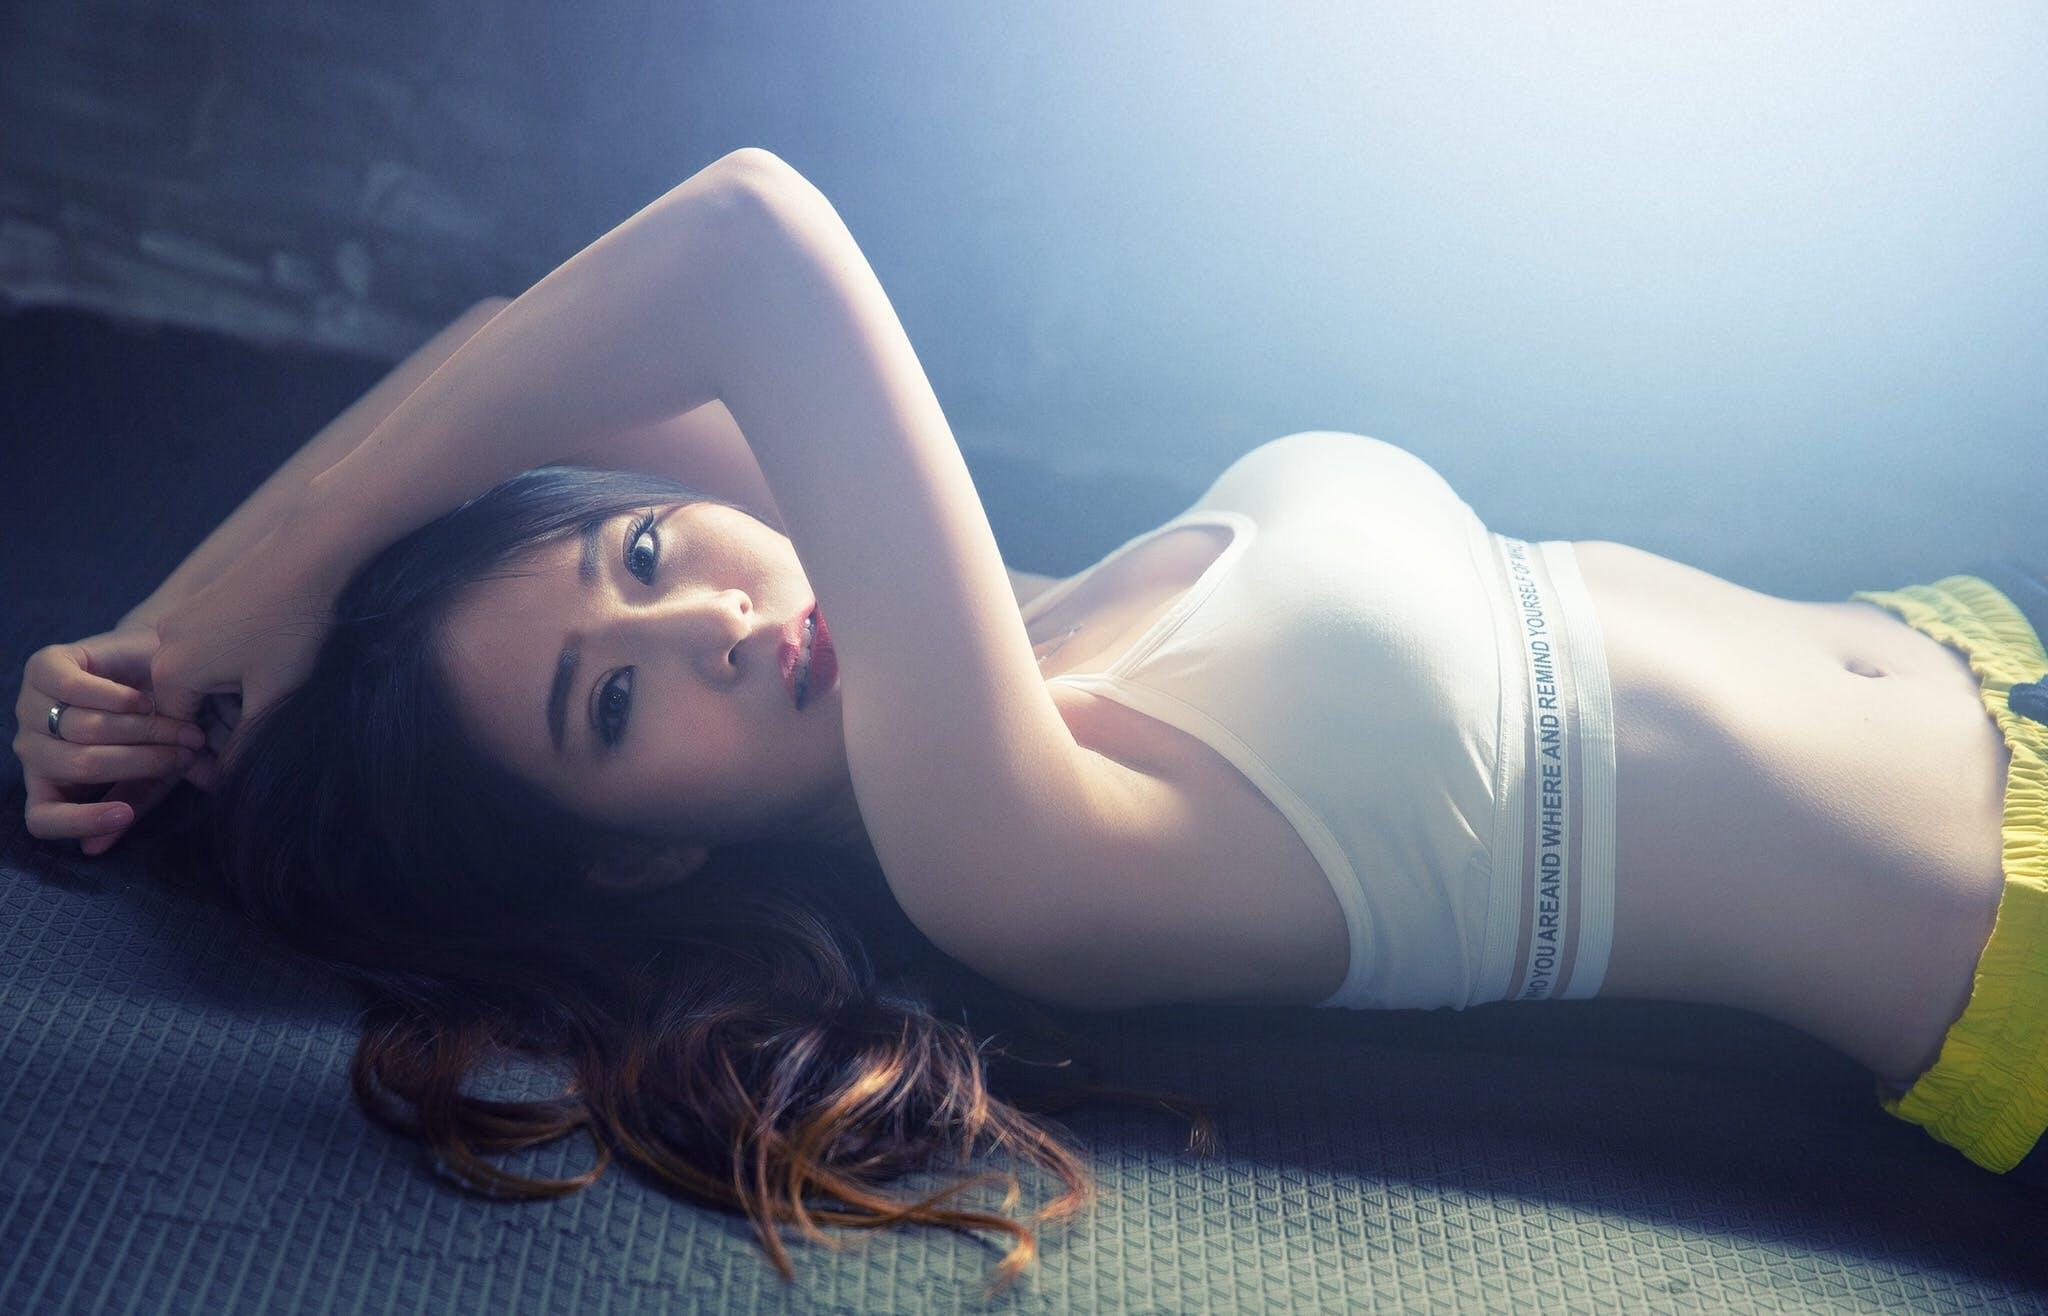 Woman Wearing White Sport Bra Lying on Black Mat